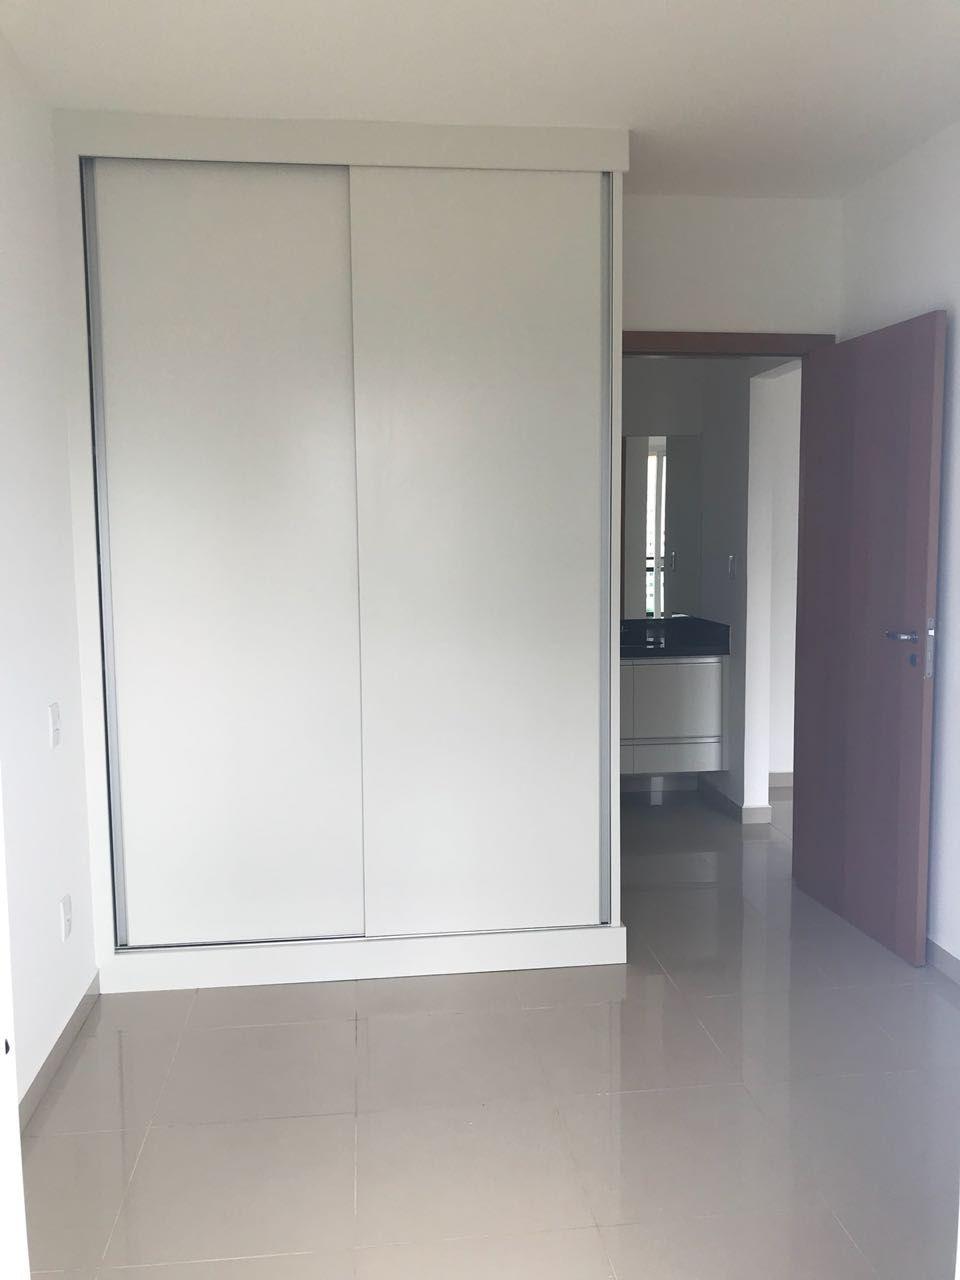 544 - Apto Nova Aliança 46 m² Vendido